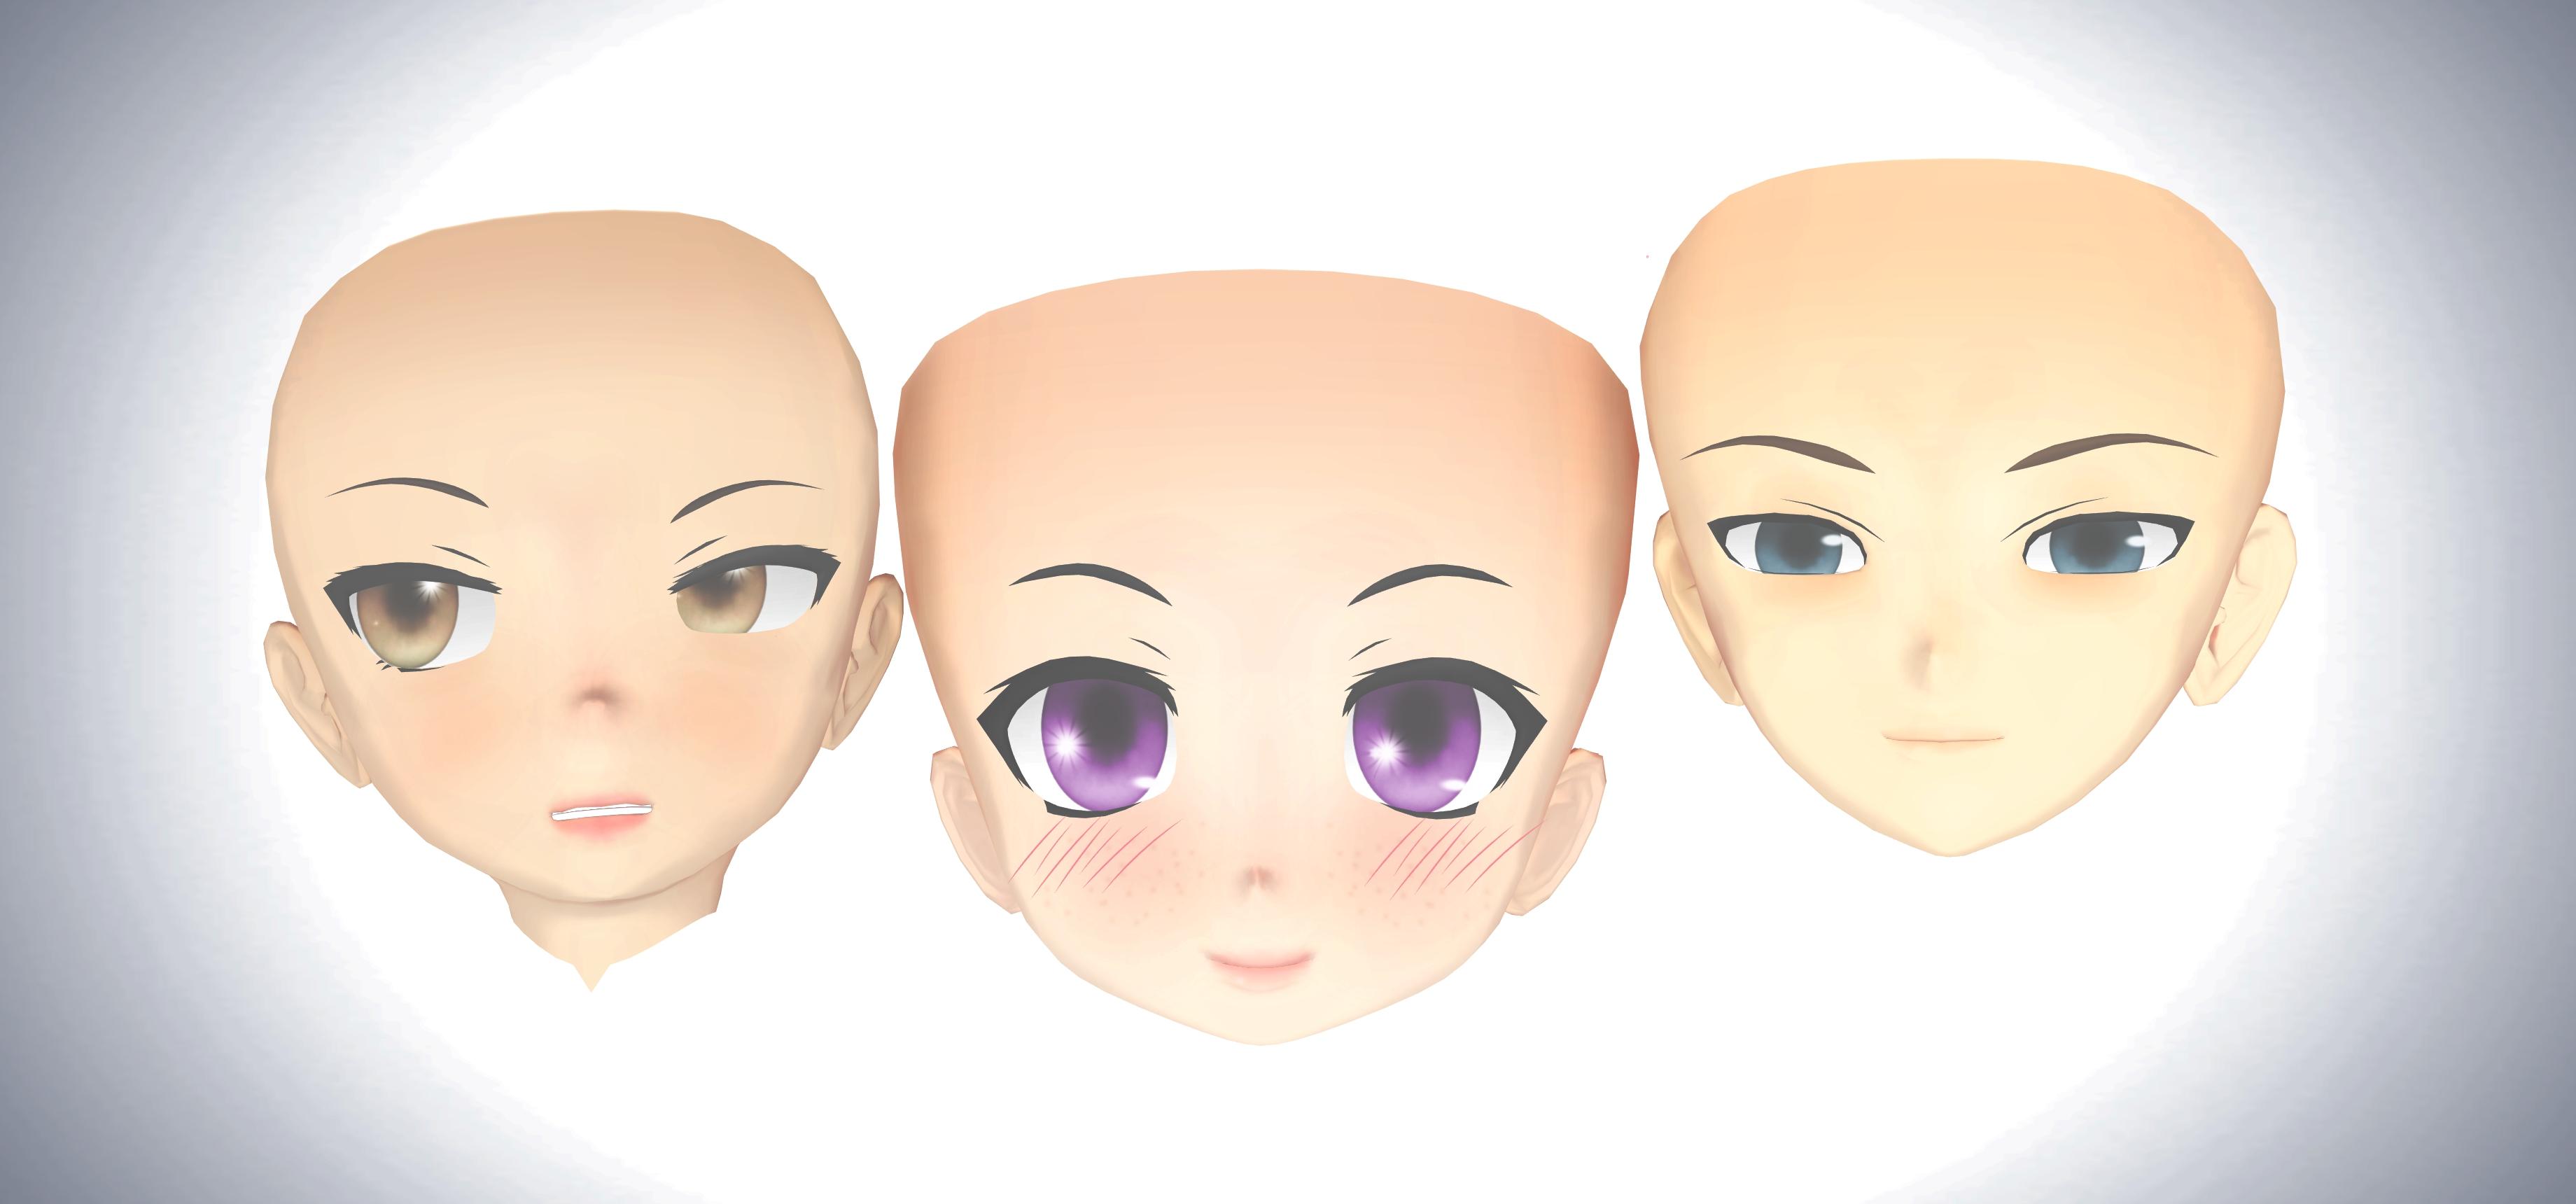 Nakao Head Edits- Download by MichiKairin